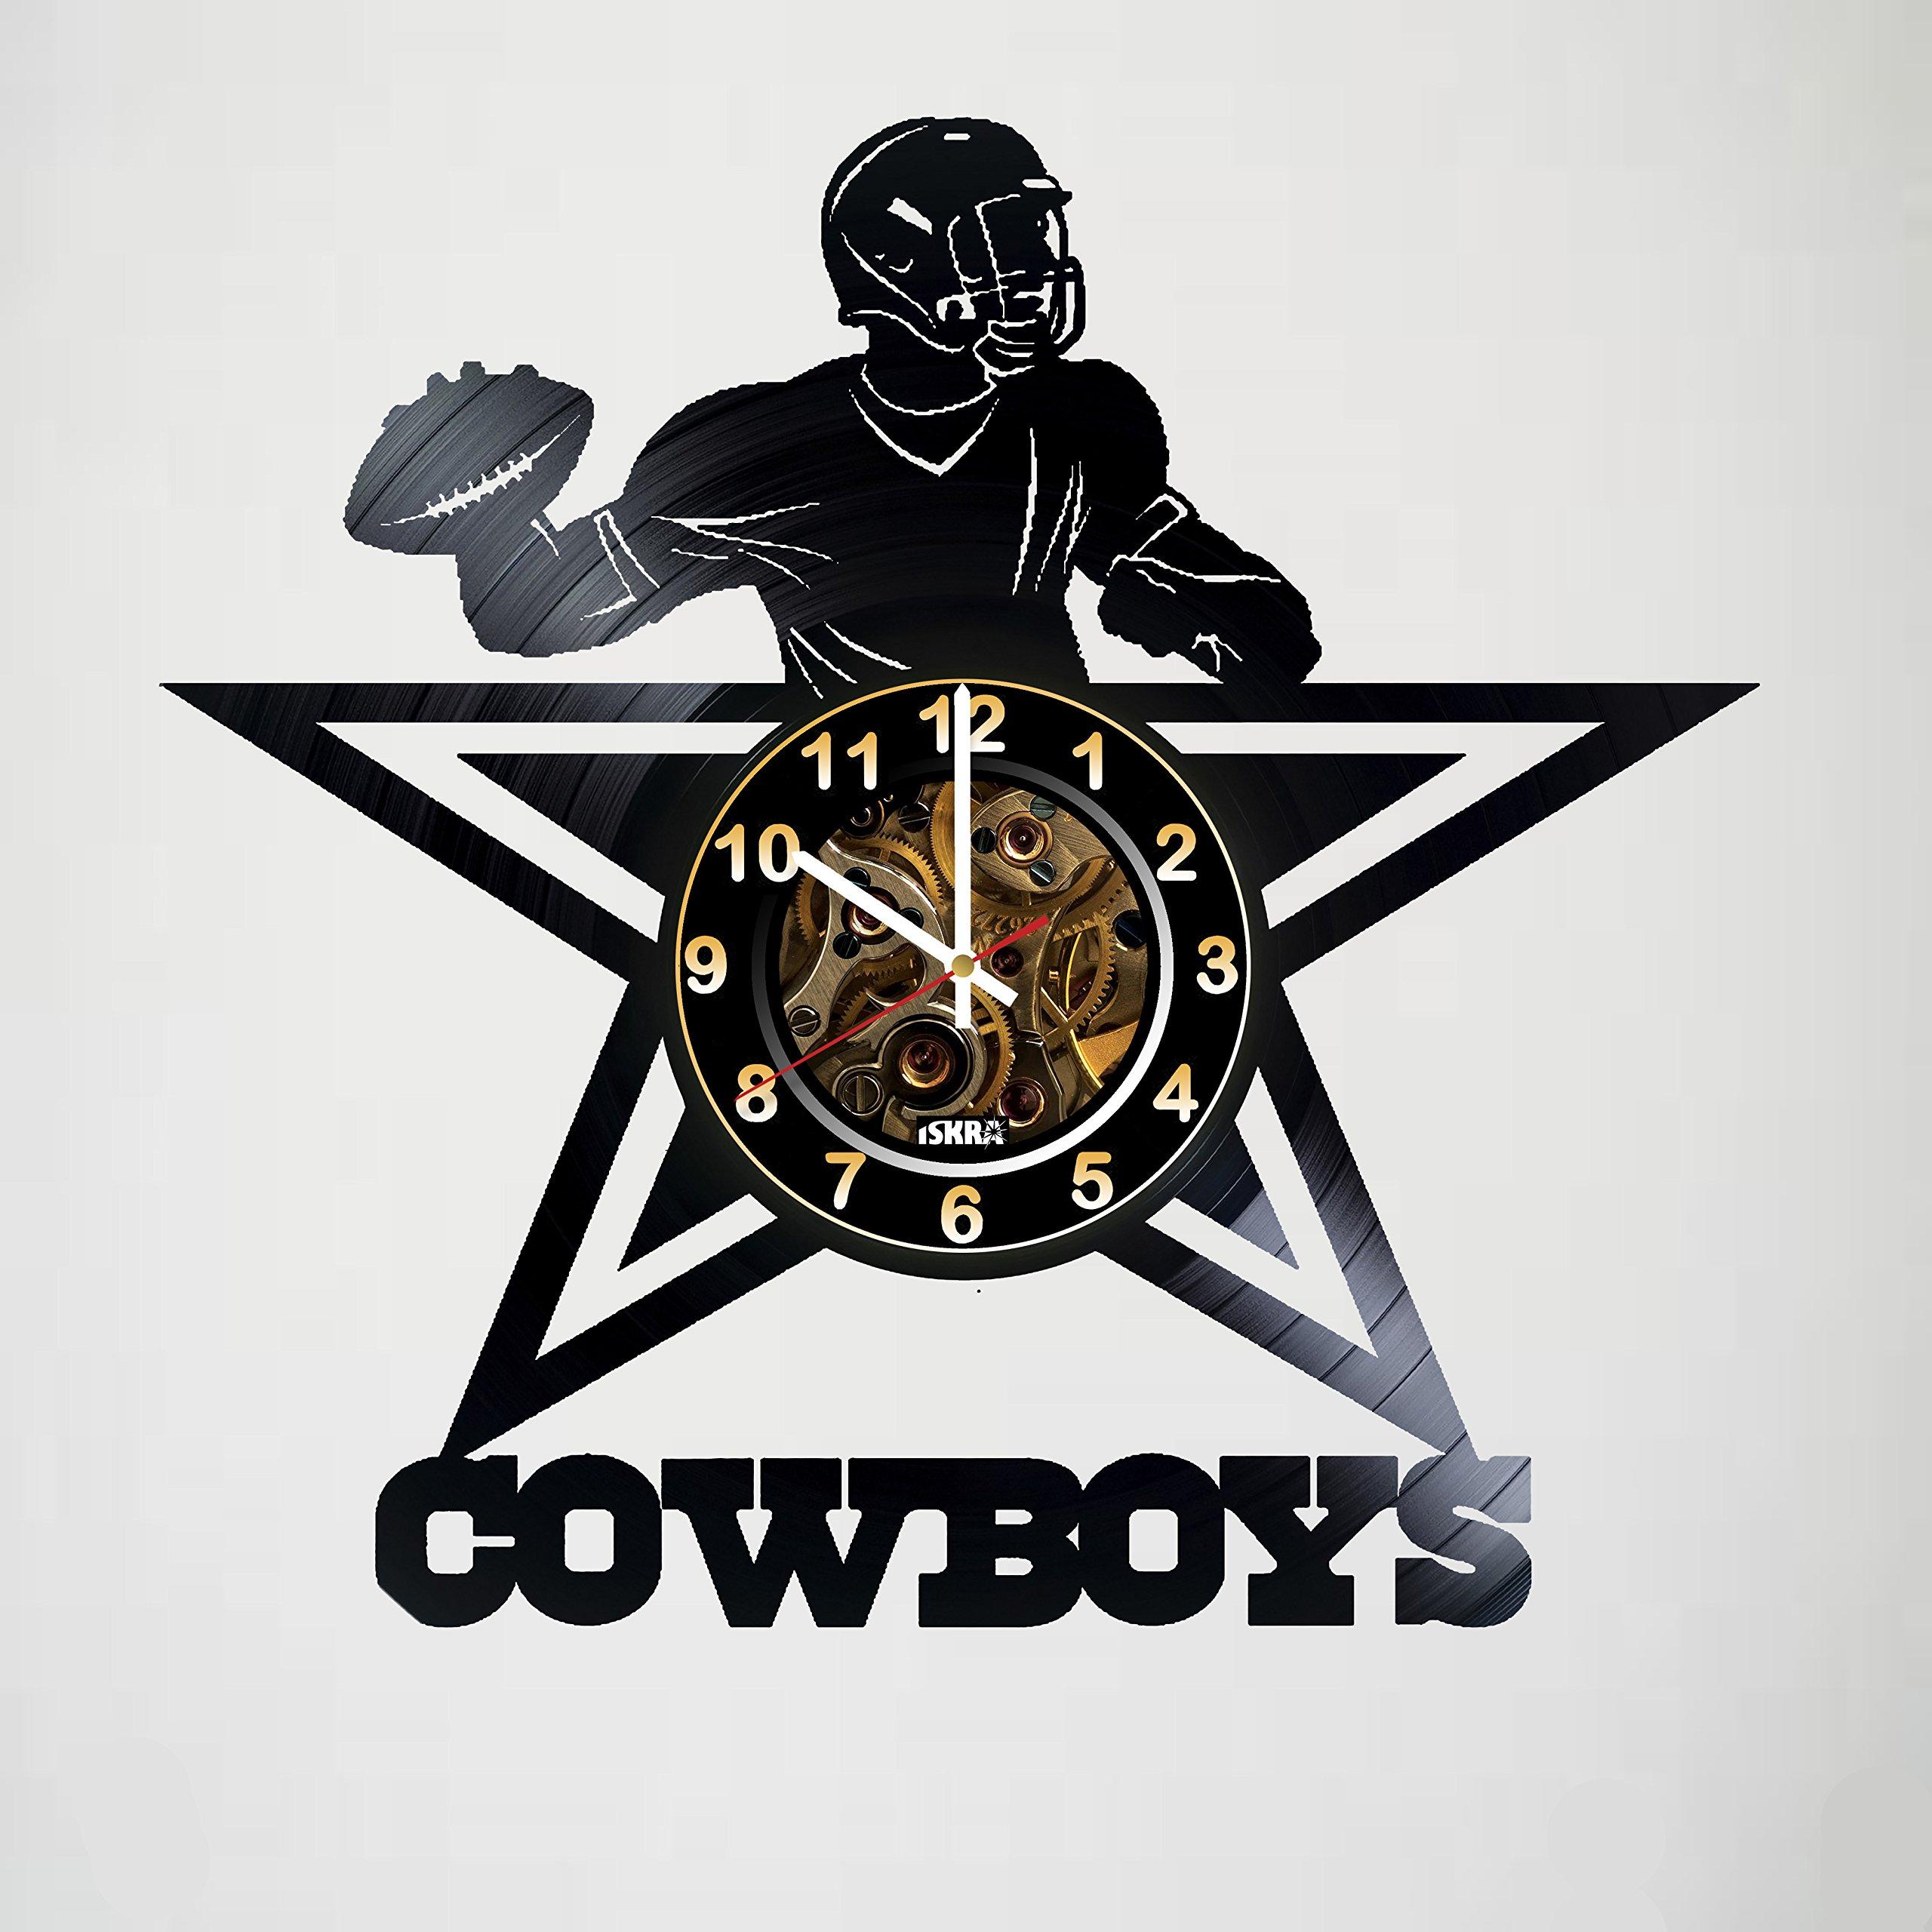 Dallas Cowboys - Football Team - Vinyl Record Wall Clock Artwork gift idea for birthday, christmas, women, men, friends, girlfriend boyfriend and teens - living kids room nursery - Best gift idea